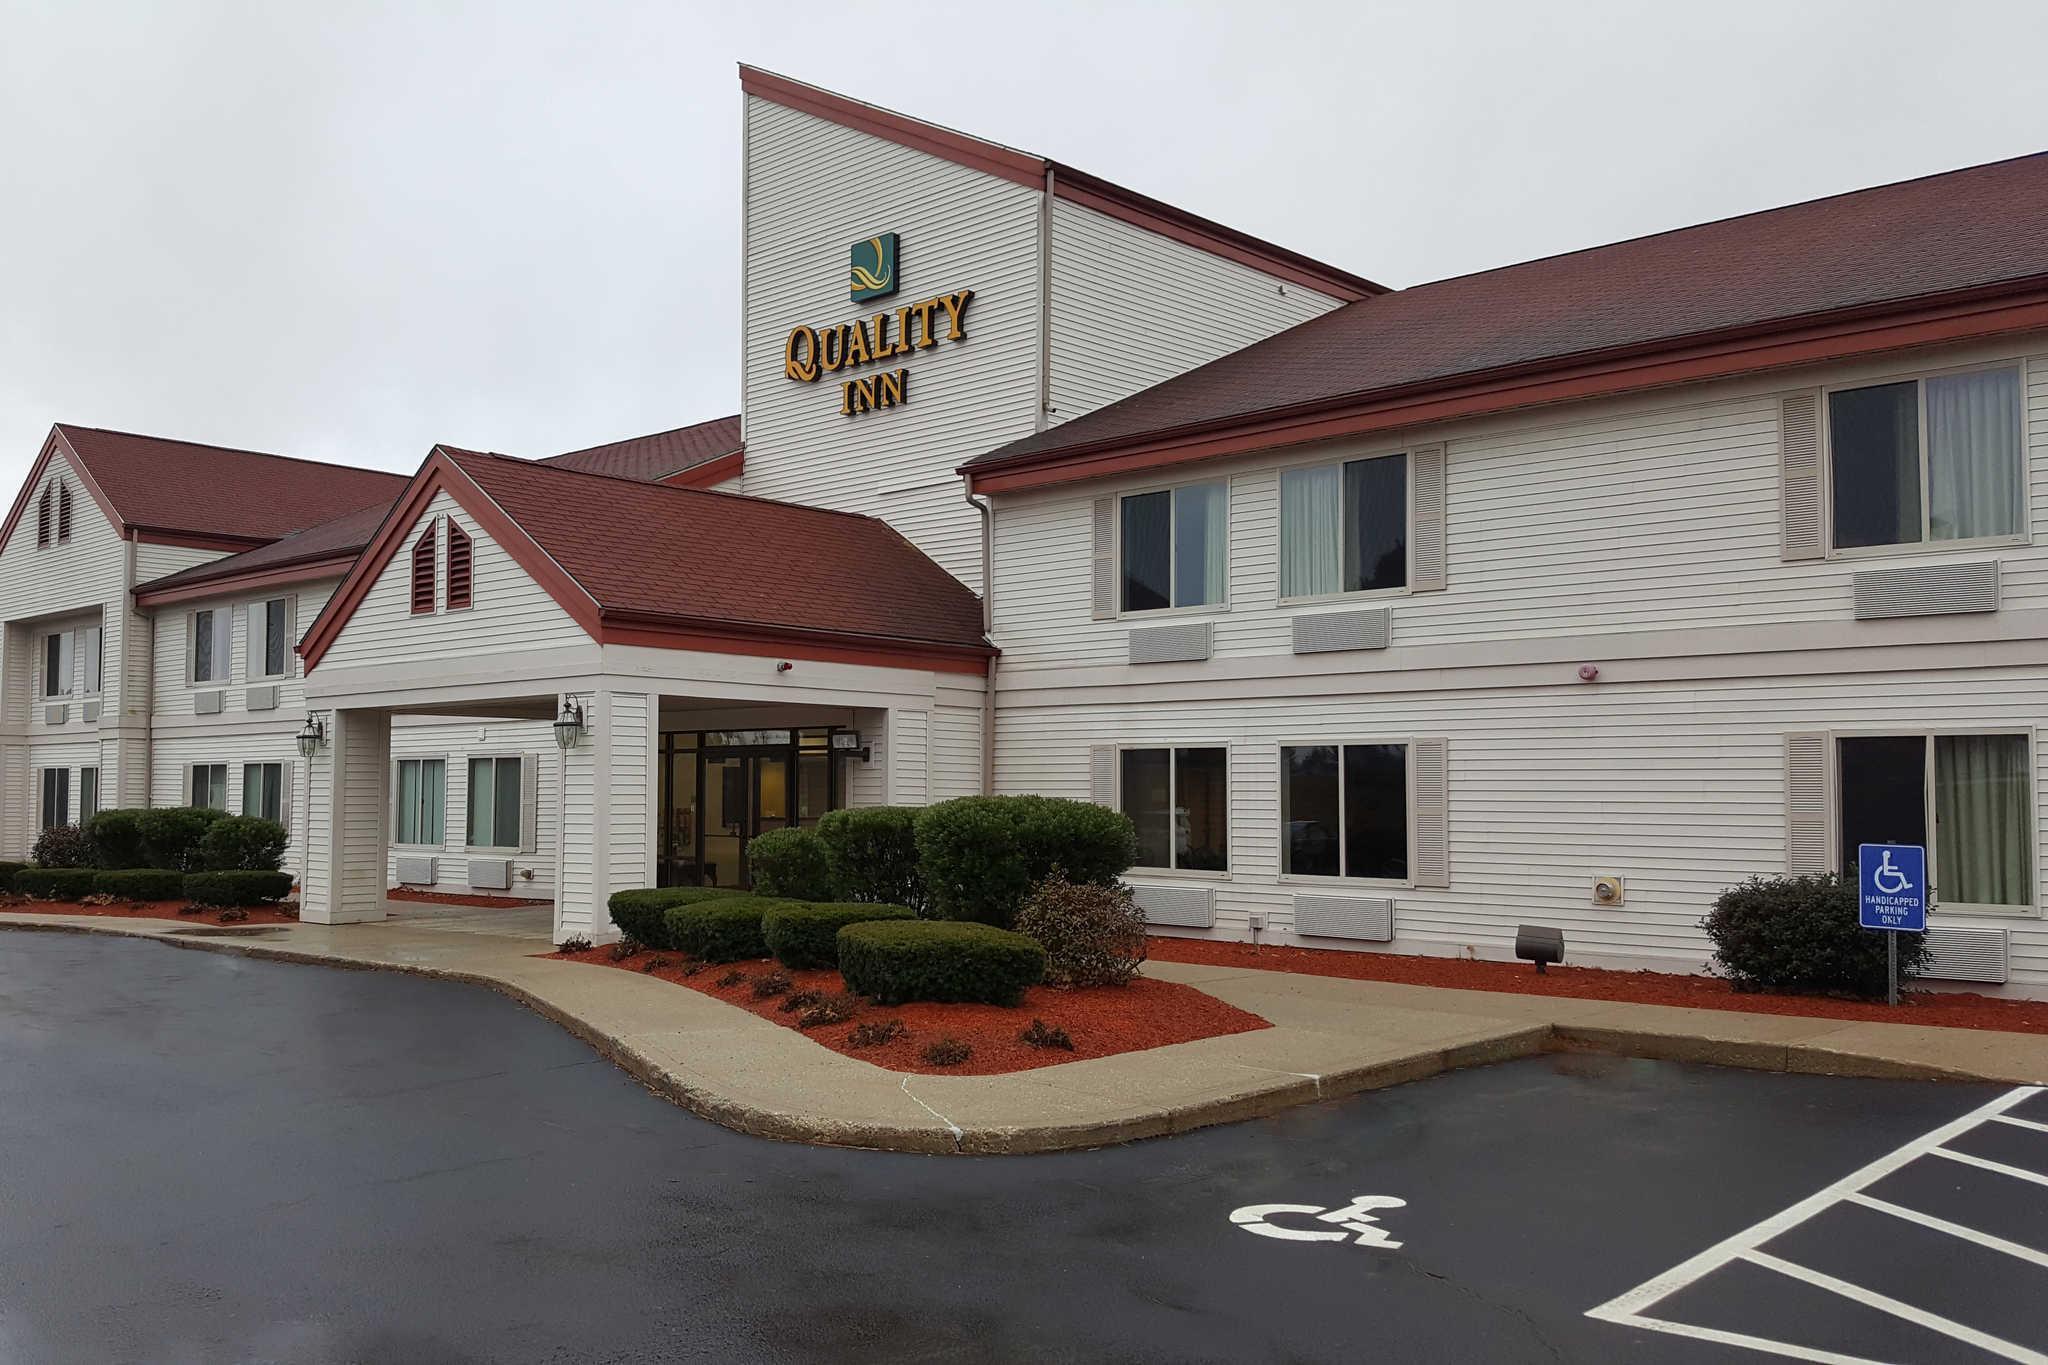 Quality Inn Loudon Concord